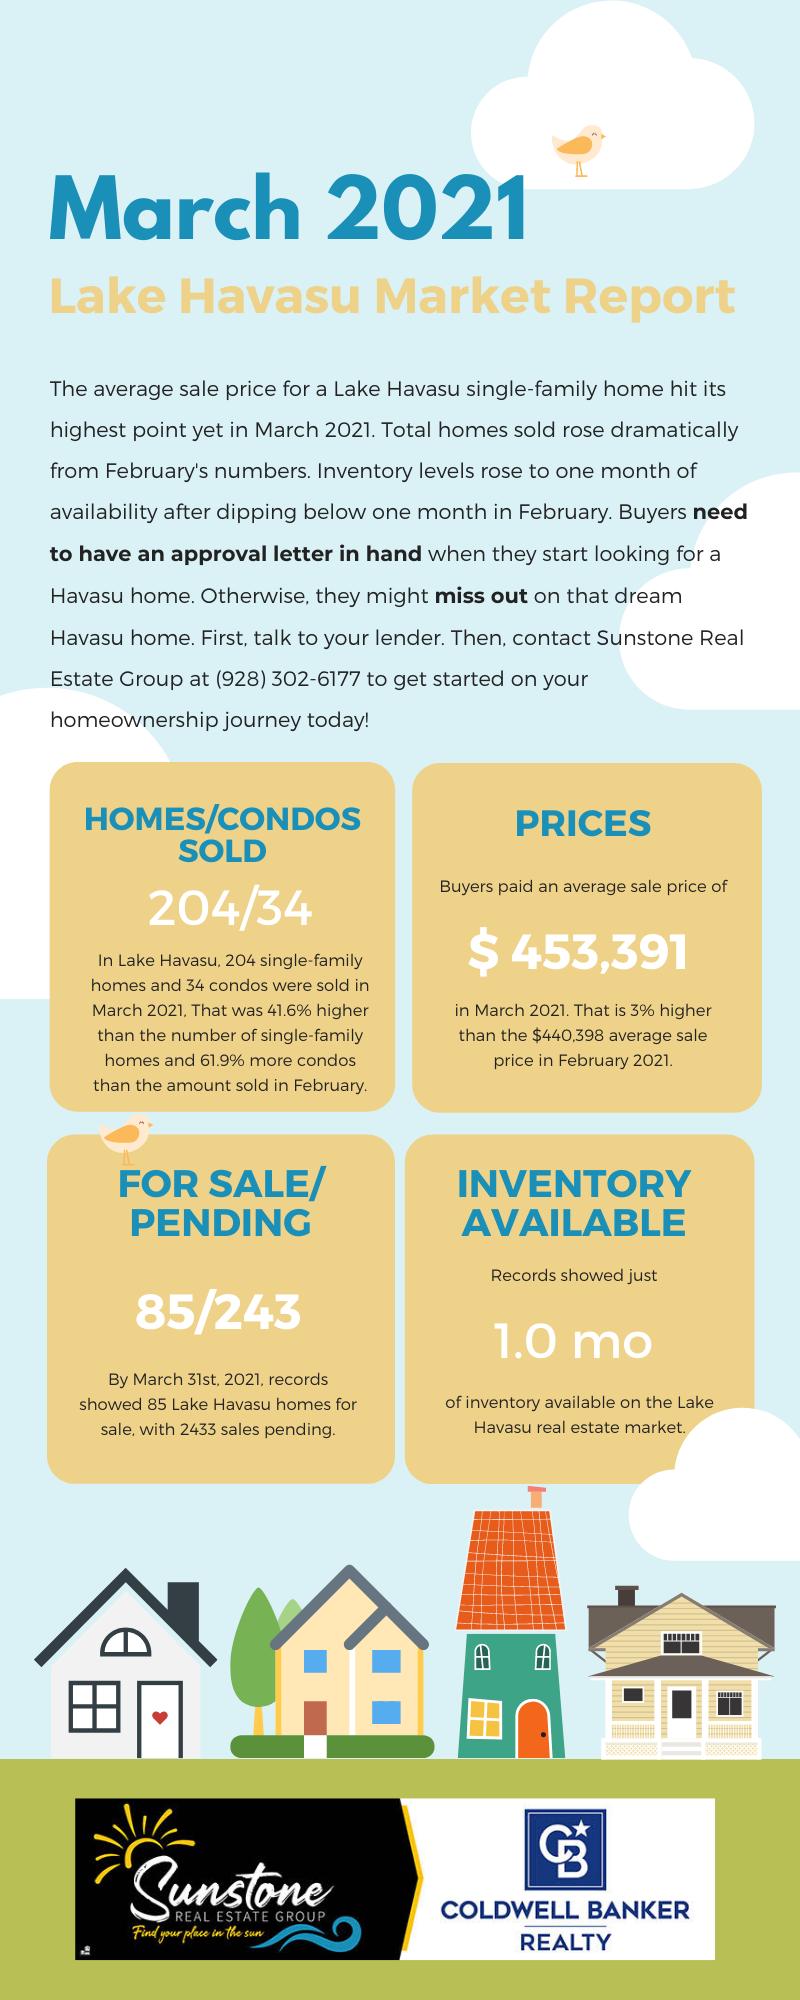 March 2021 Lake Havasu Market Report.png